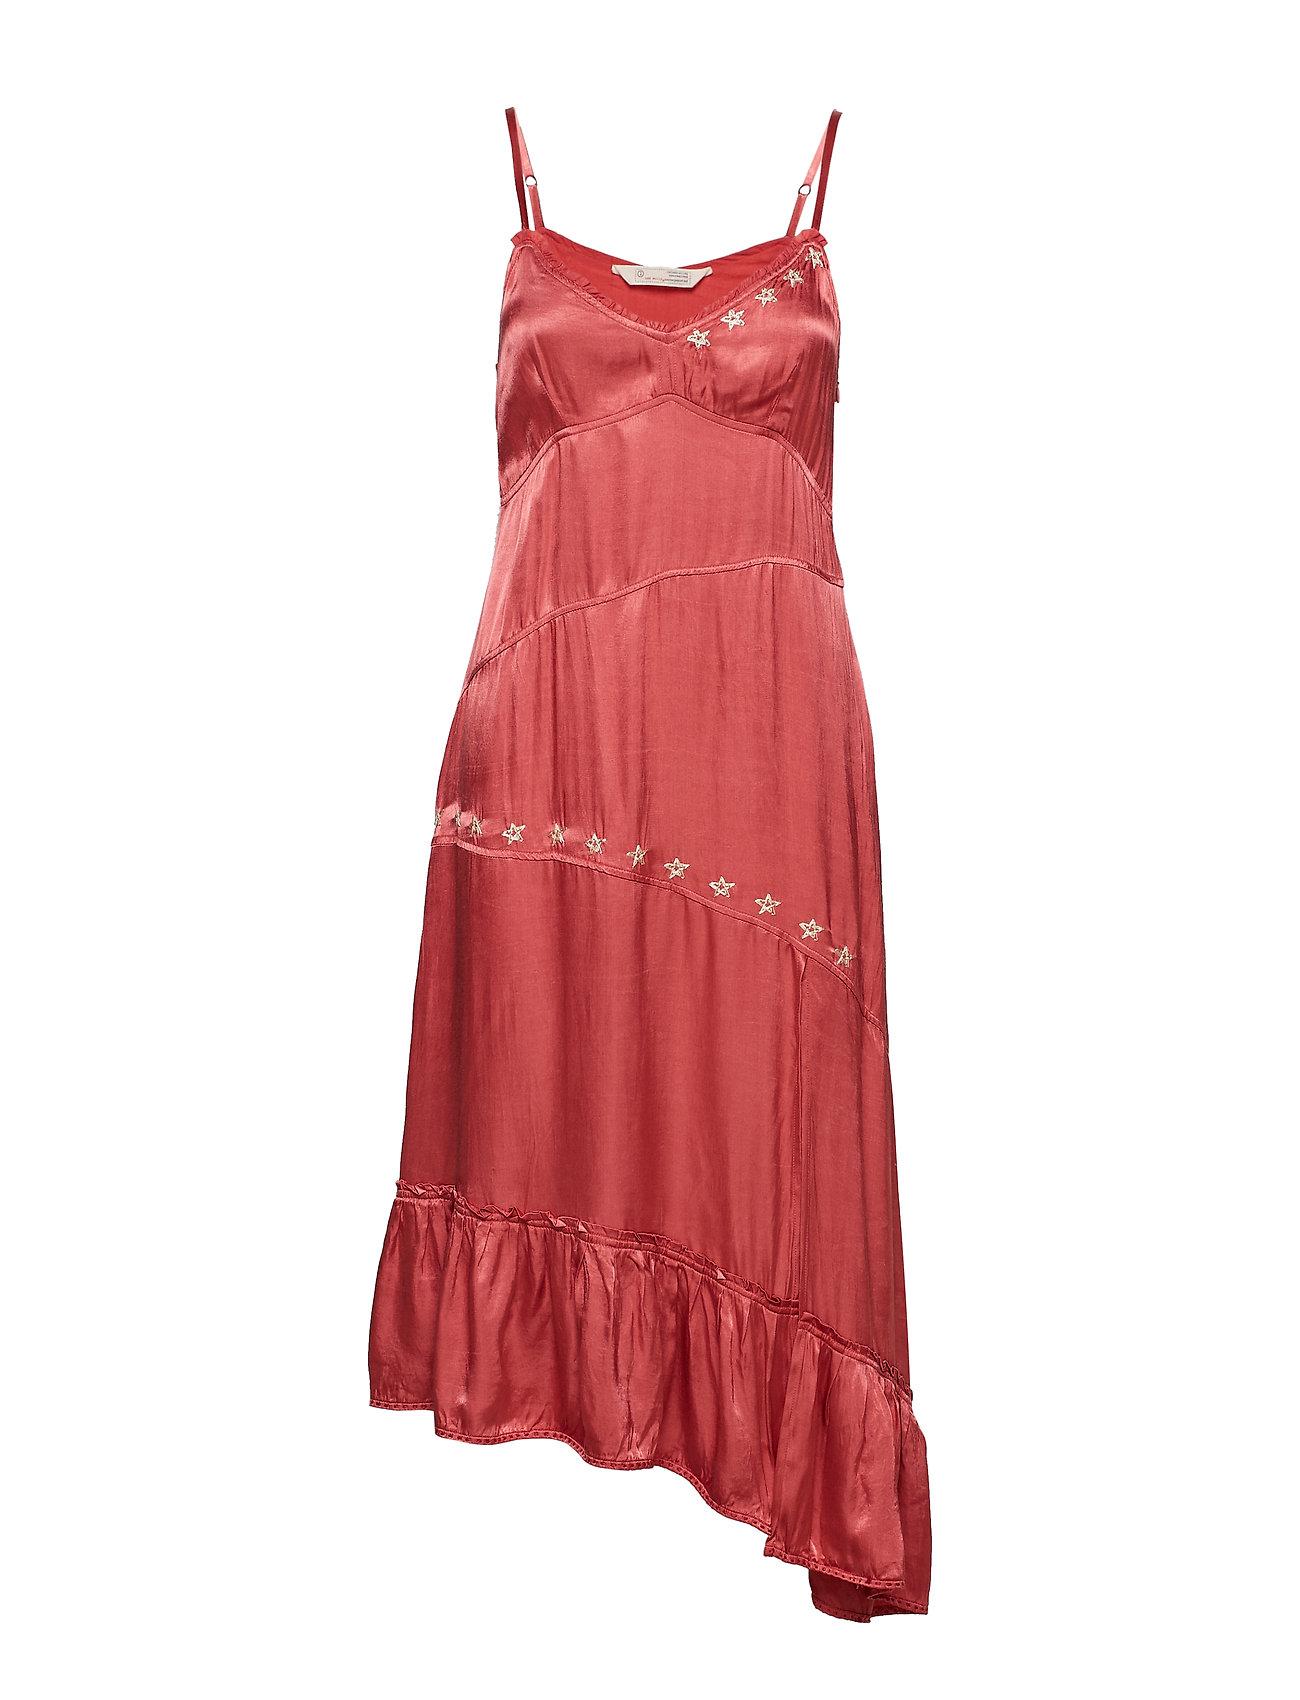 ODD MOLLY party angles dress